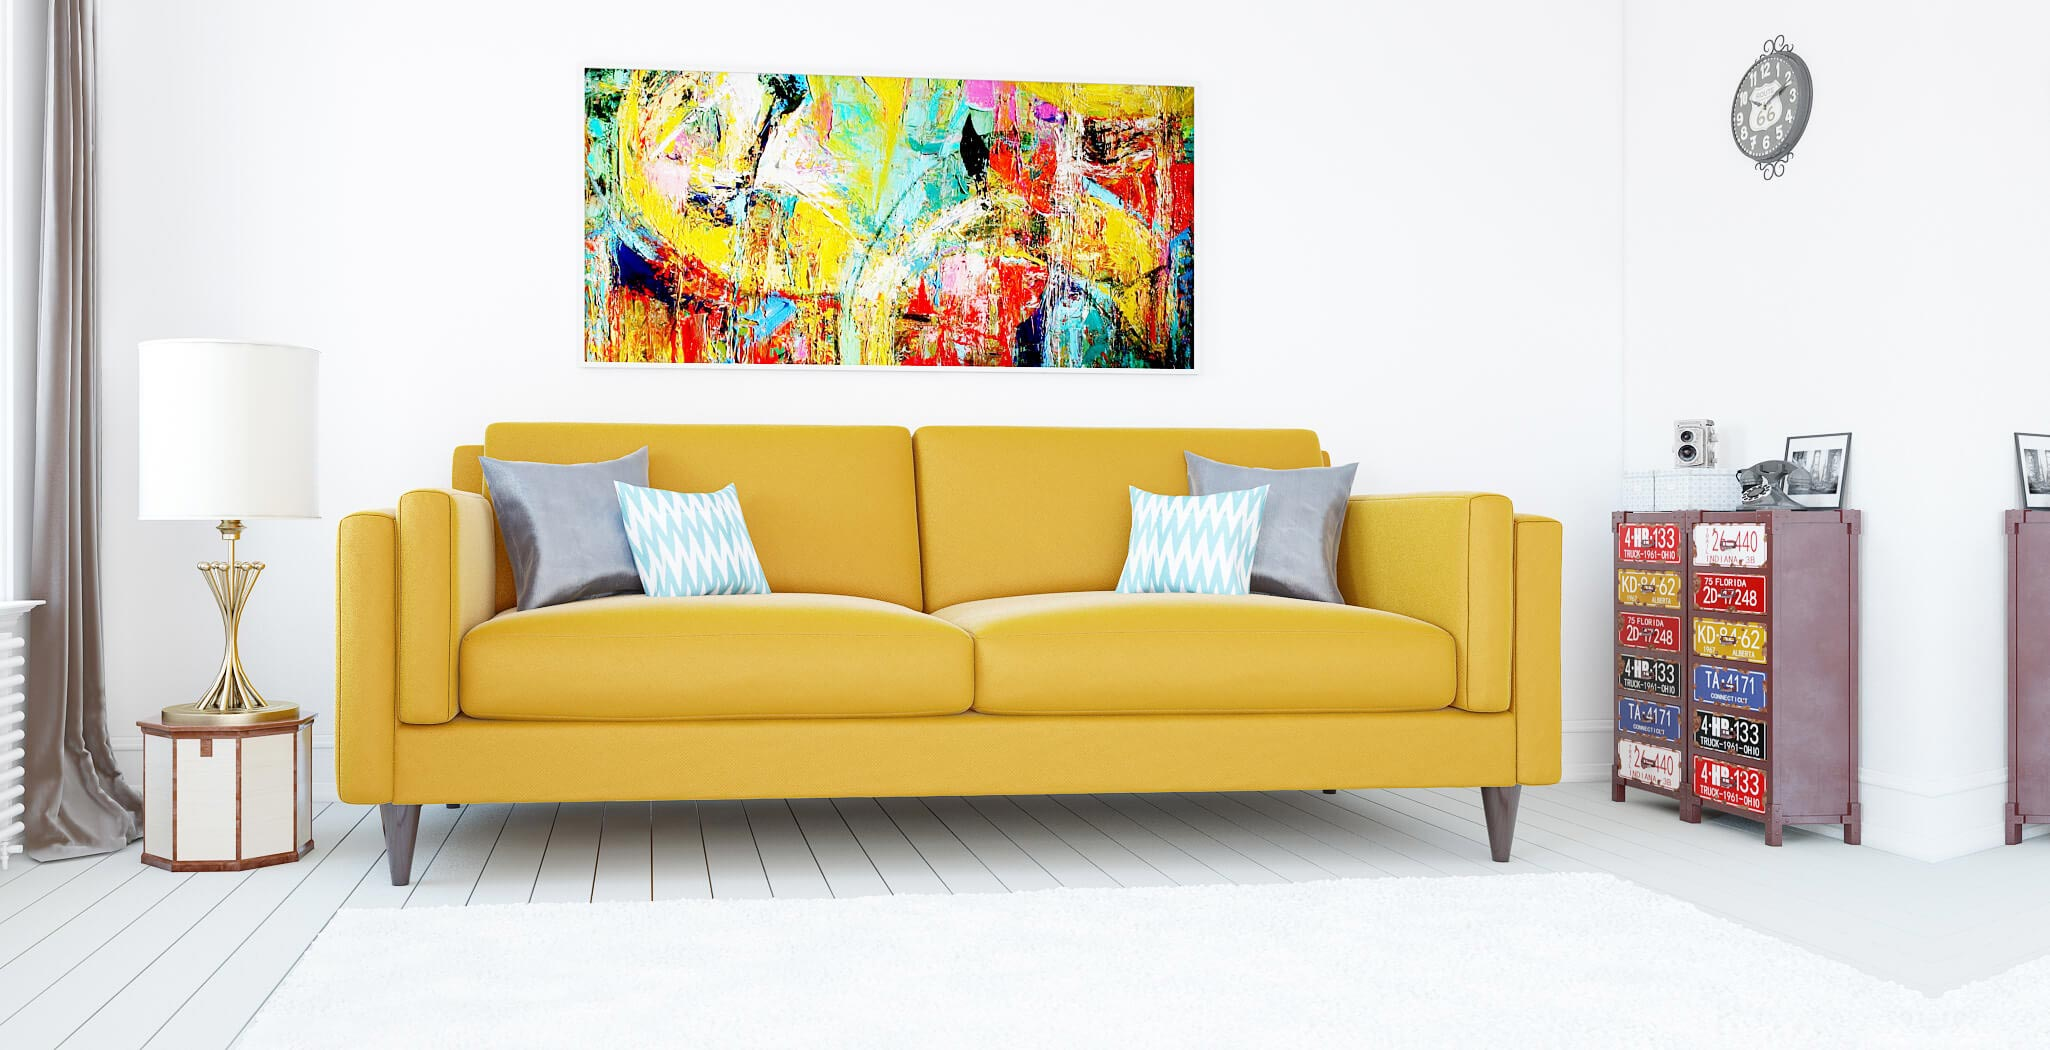 helsinki sofa furniture gallery 3